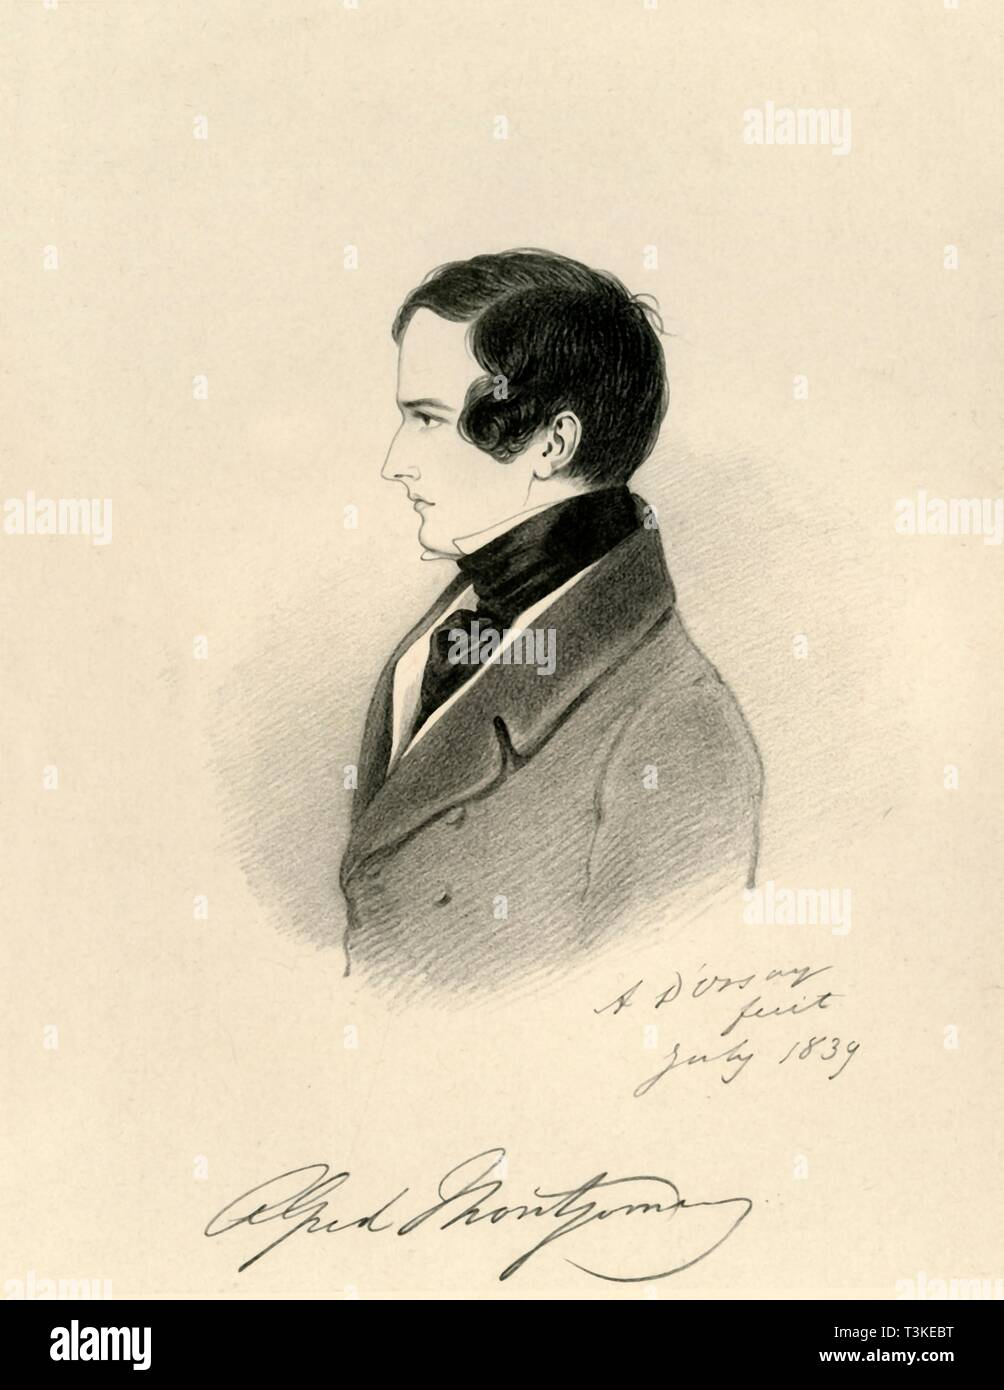 'Alfred Montgomery', 1839. Creator: Richard James Lane. - Stock Image